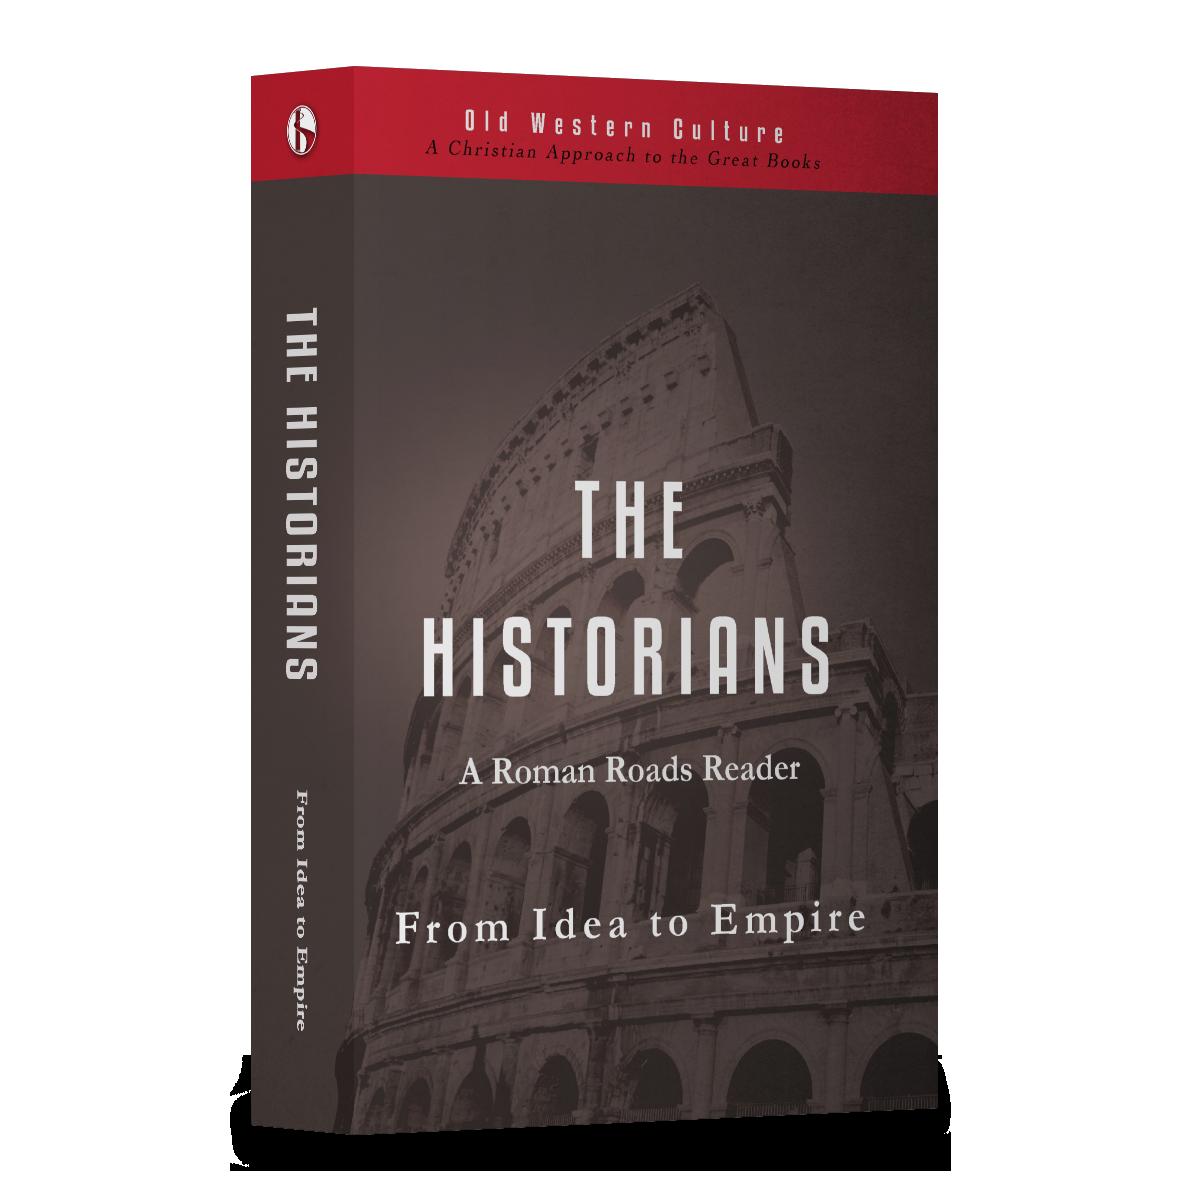 Y2 Q2: The Historians